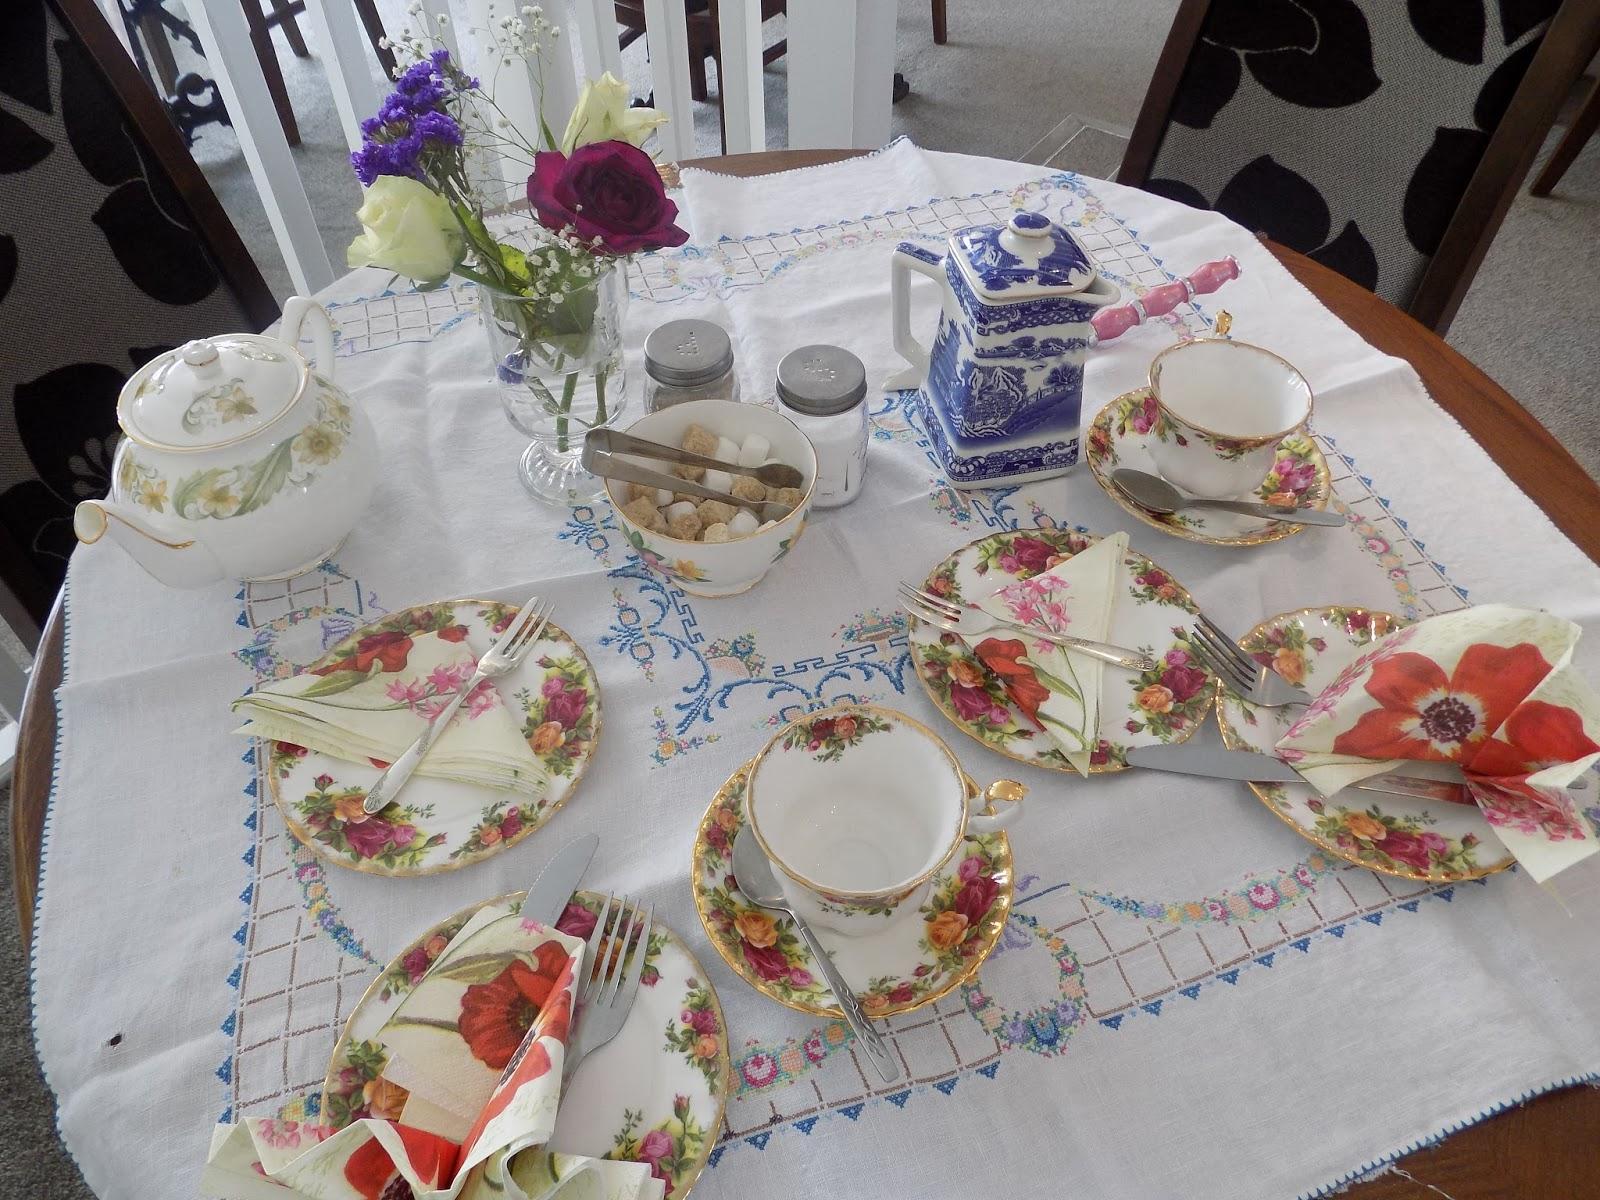 Review of Helene's tearoom, Skipton. Afternoon tea.